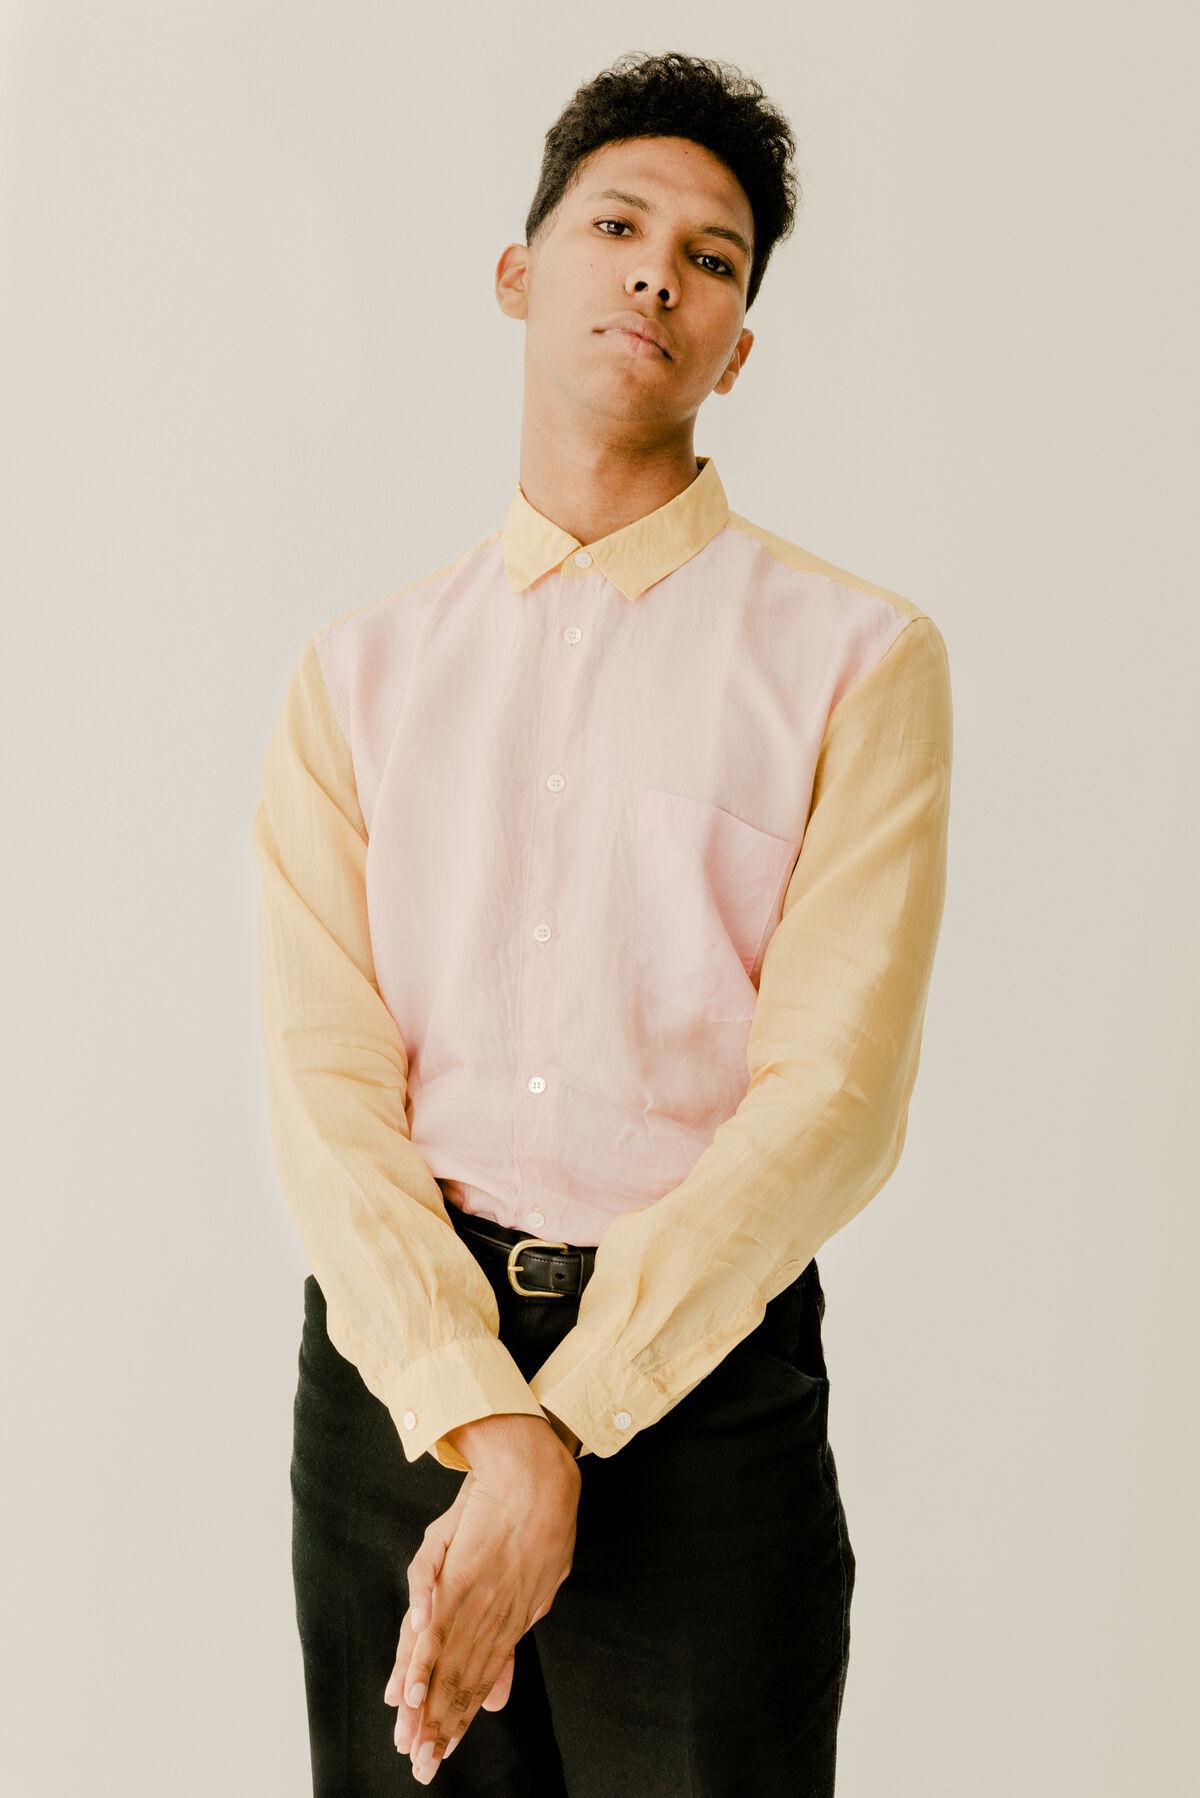 Tyler Mitchell by Daniel Dorsa for Artsy.